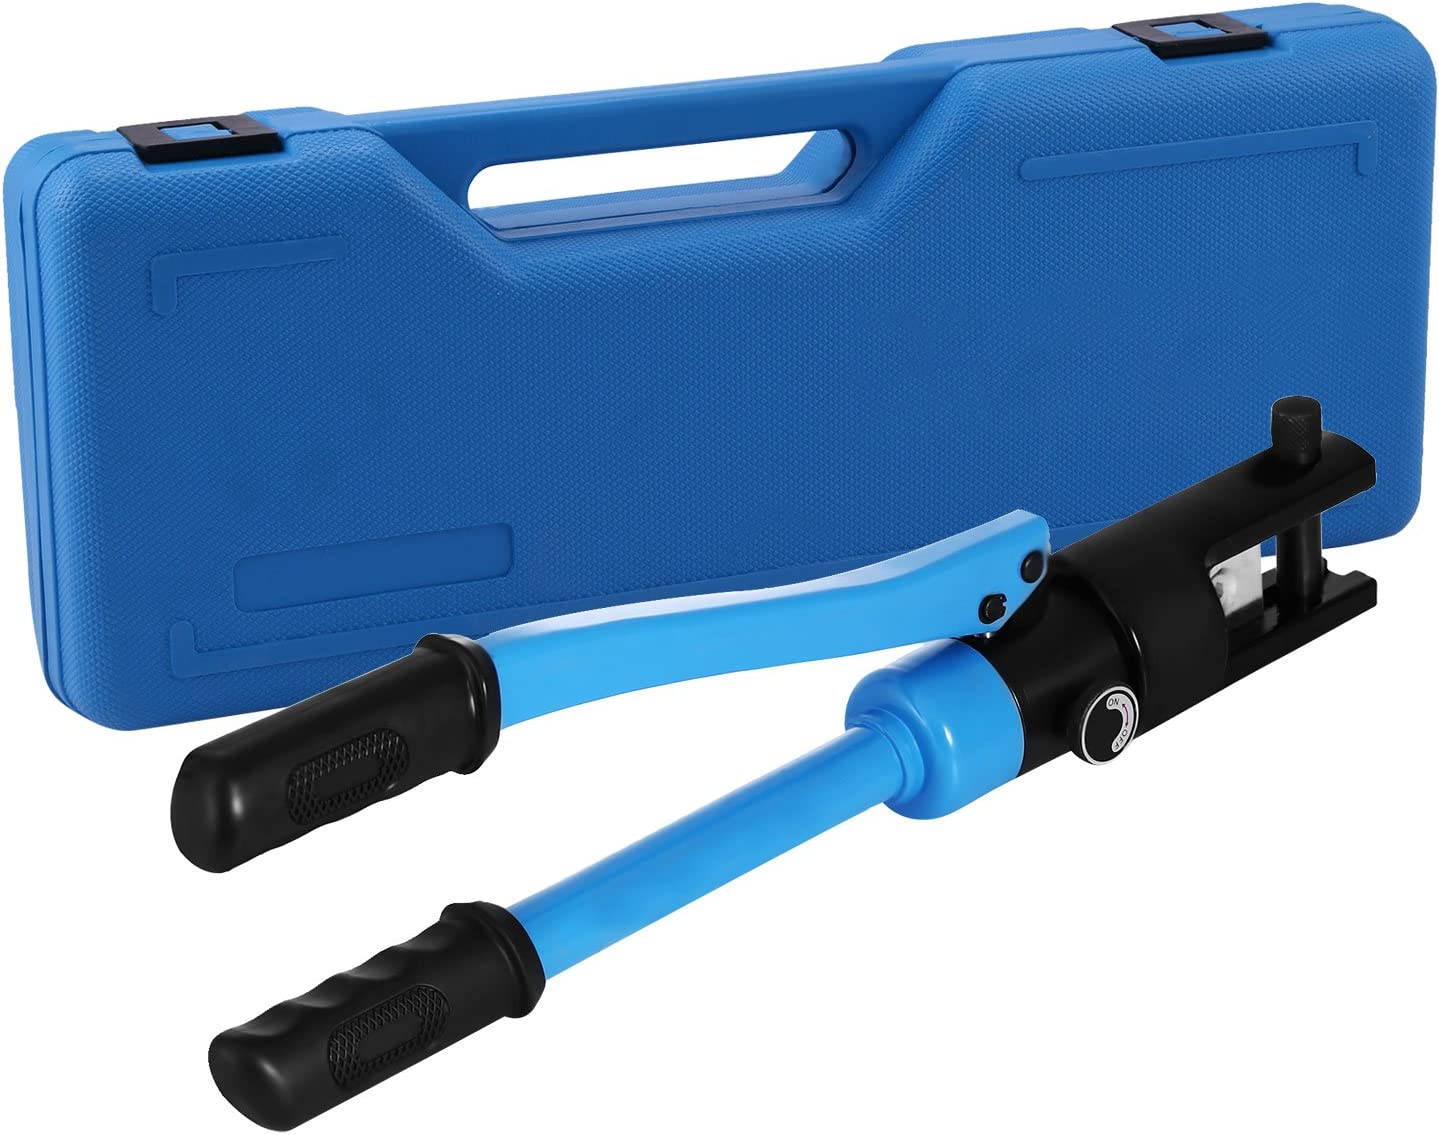 16-300mm2 SucceBuy Pince de Serrage Pipe Clamp Outil de Sertissage Pince Sertir Hydraulic Crimper 6 AWG to 600 MCM